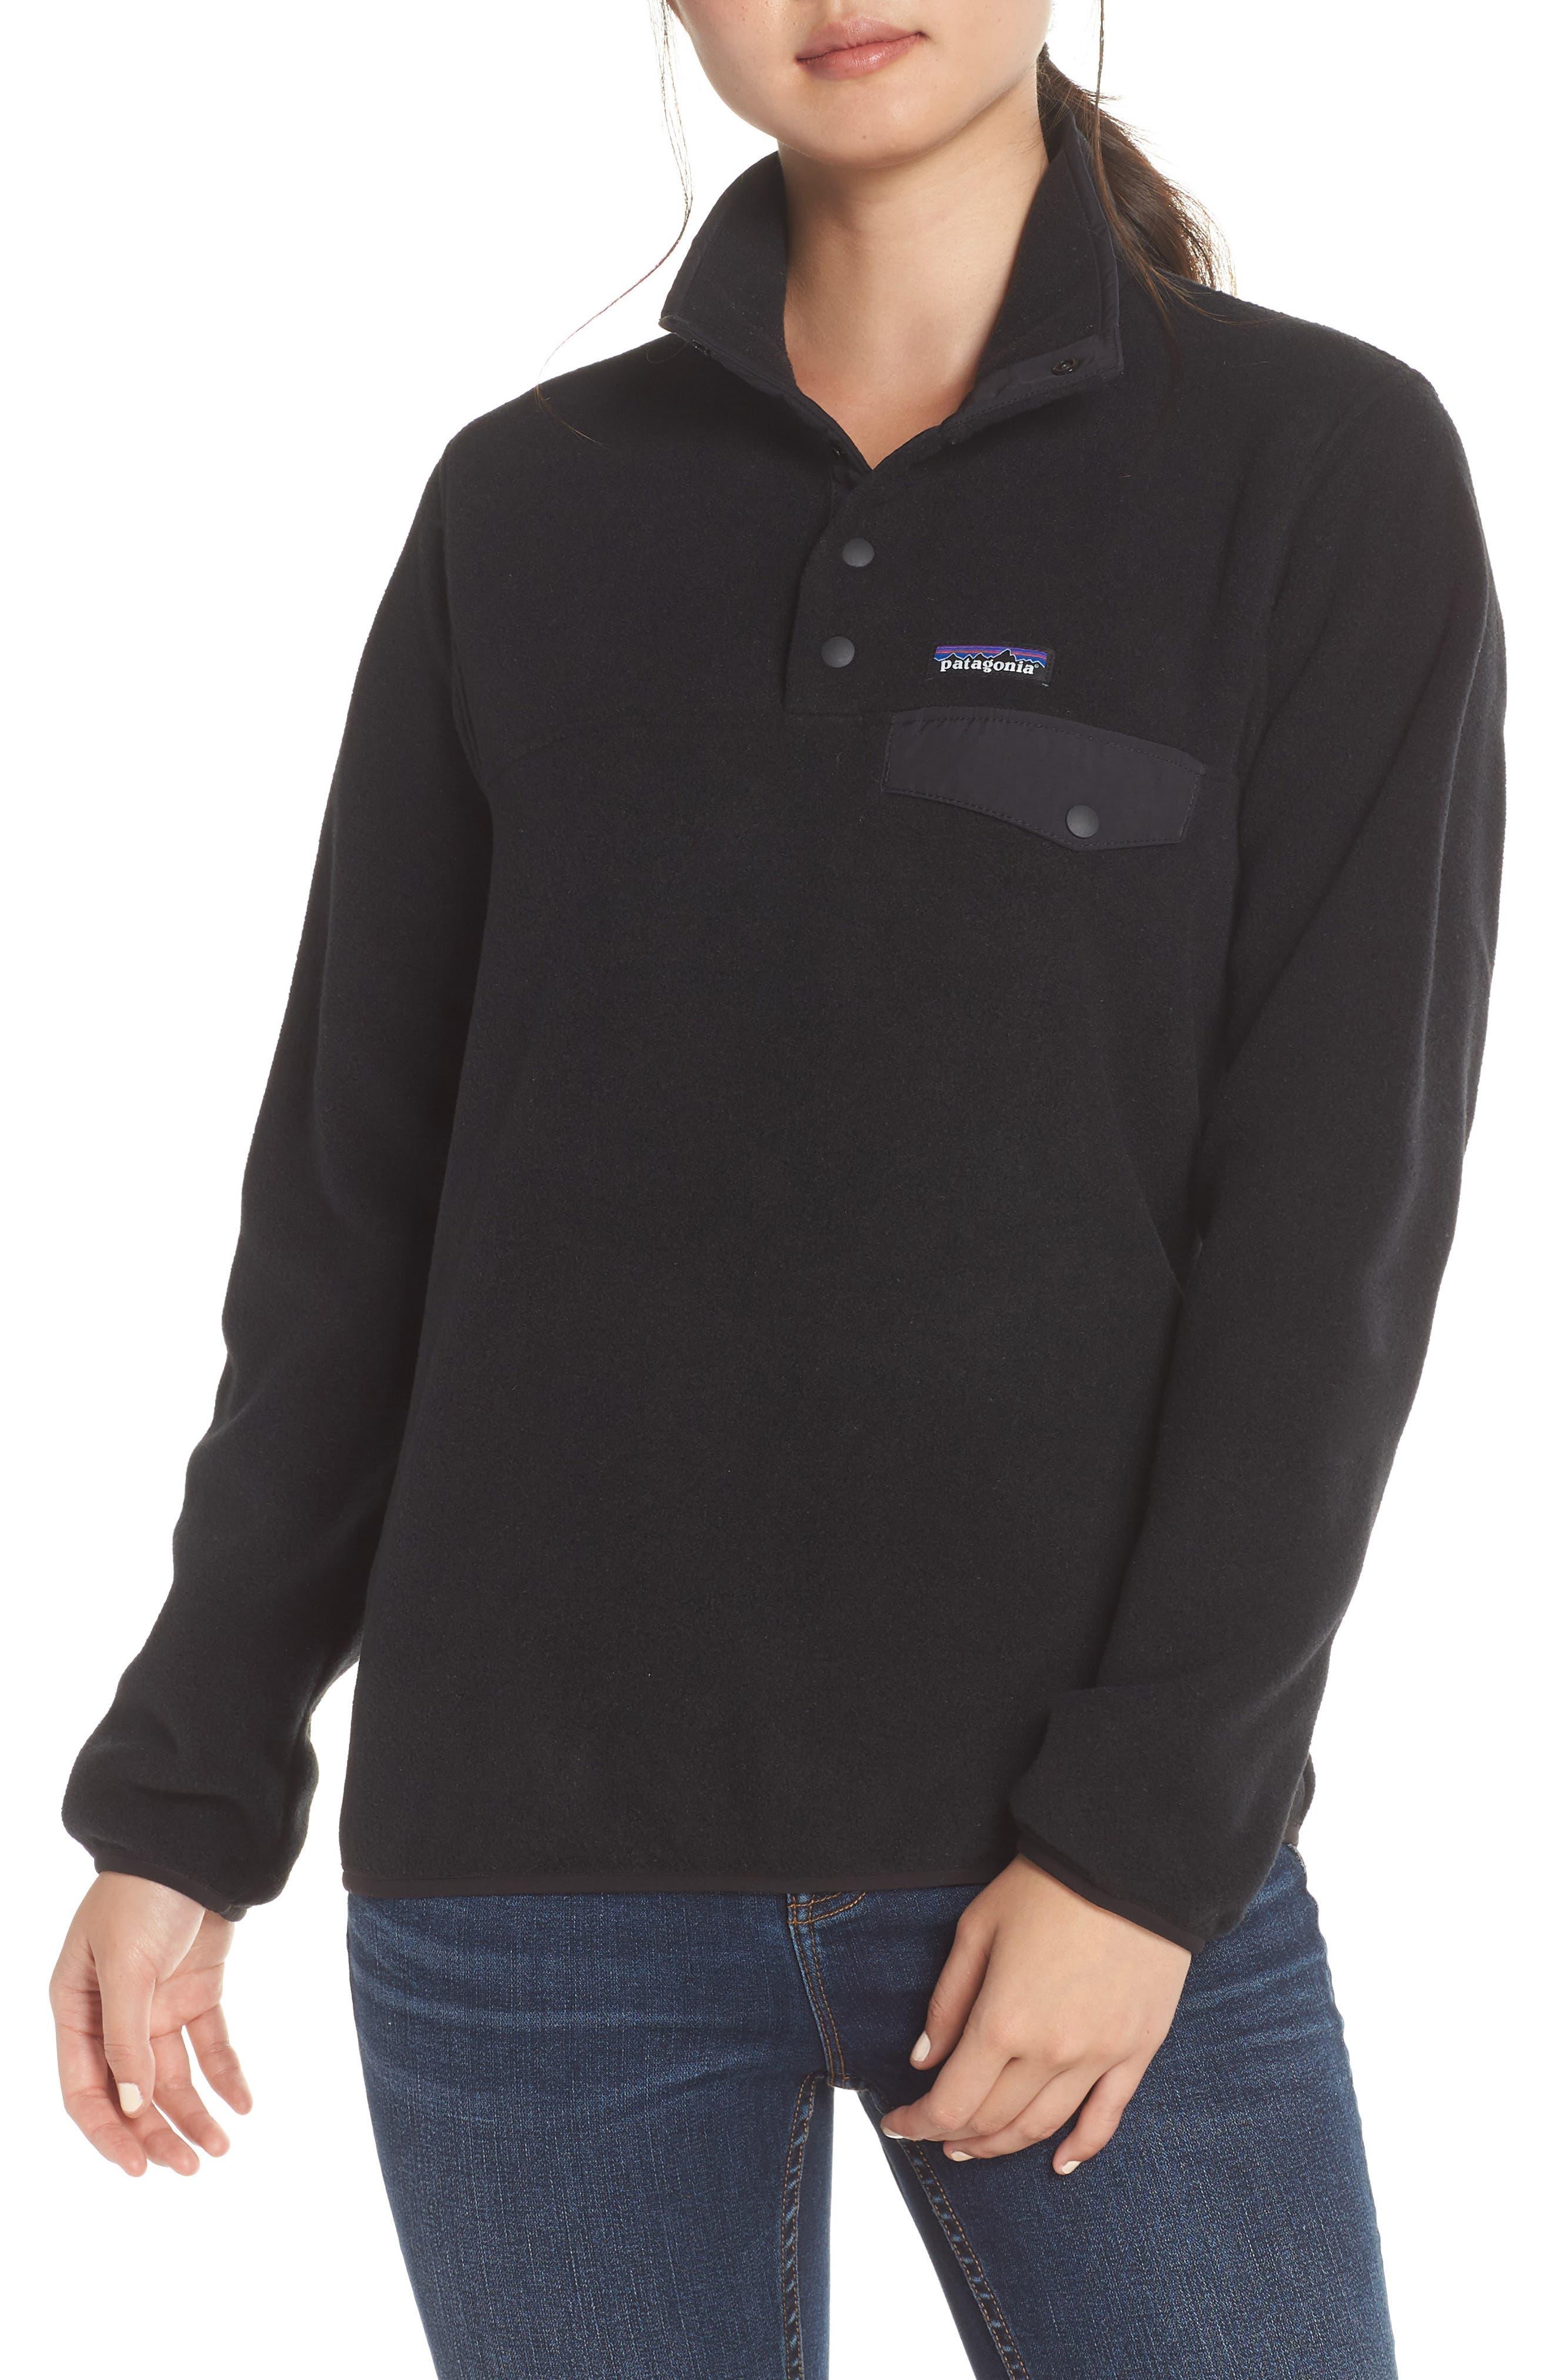 Synchilla Snap-T<sup>®</sup> Fleece Pullover,                         Main,                         color, BLACK W/ BLACK